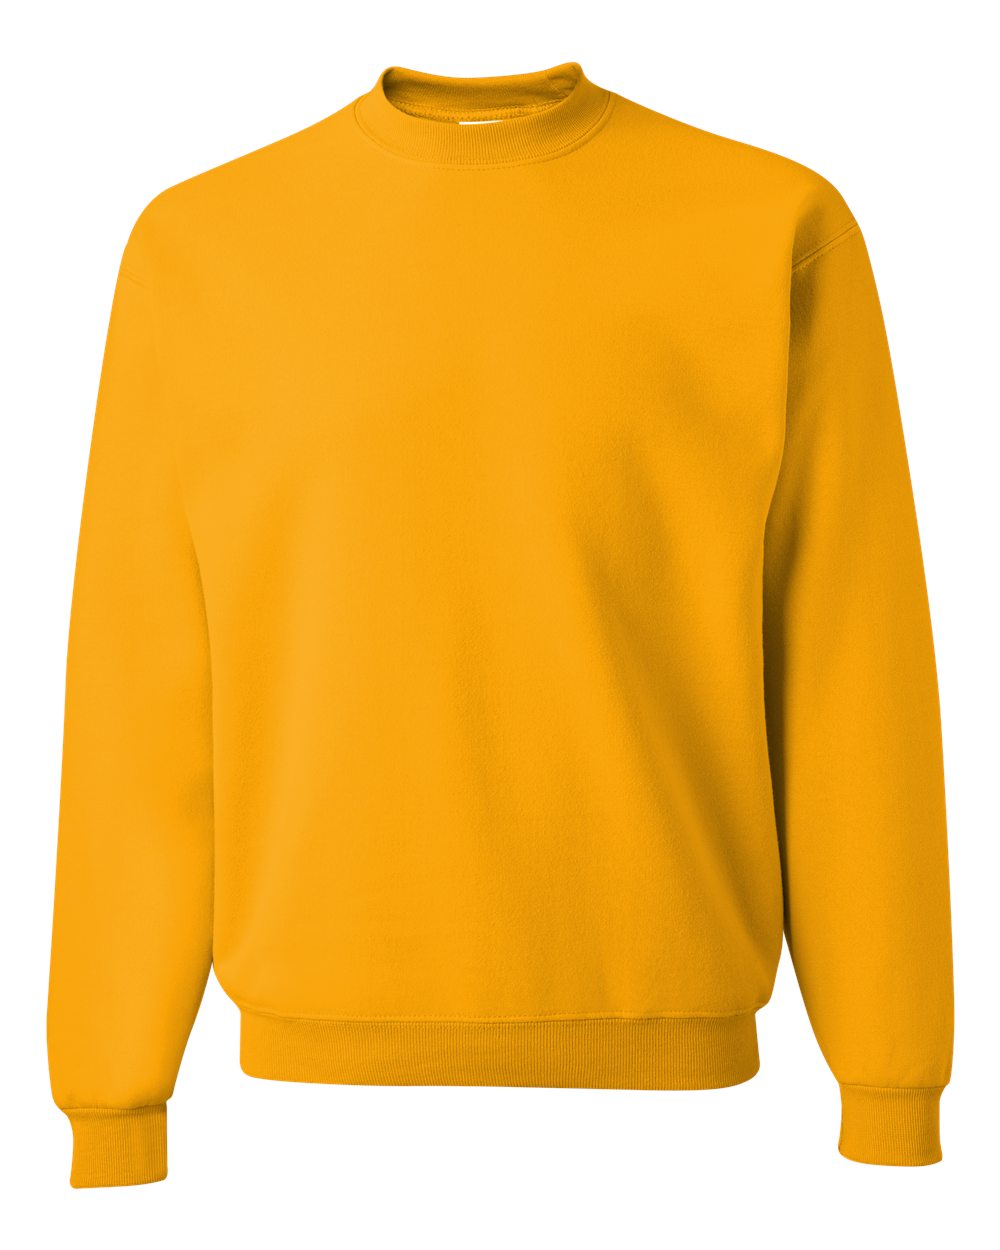 Jerzees NuBlend Crewneck Sweatshirt